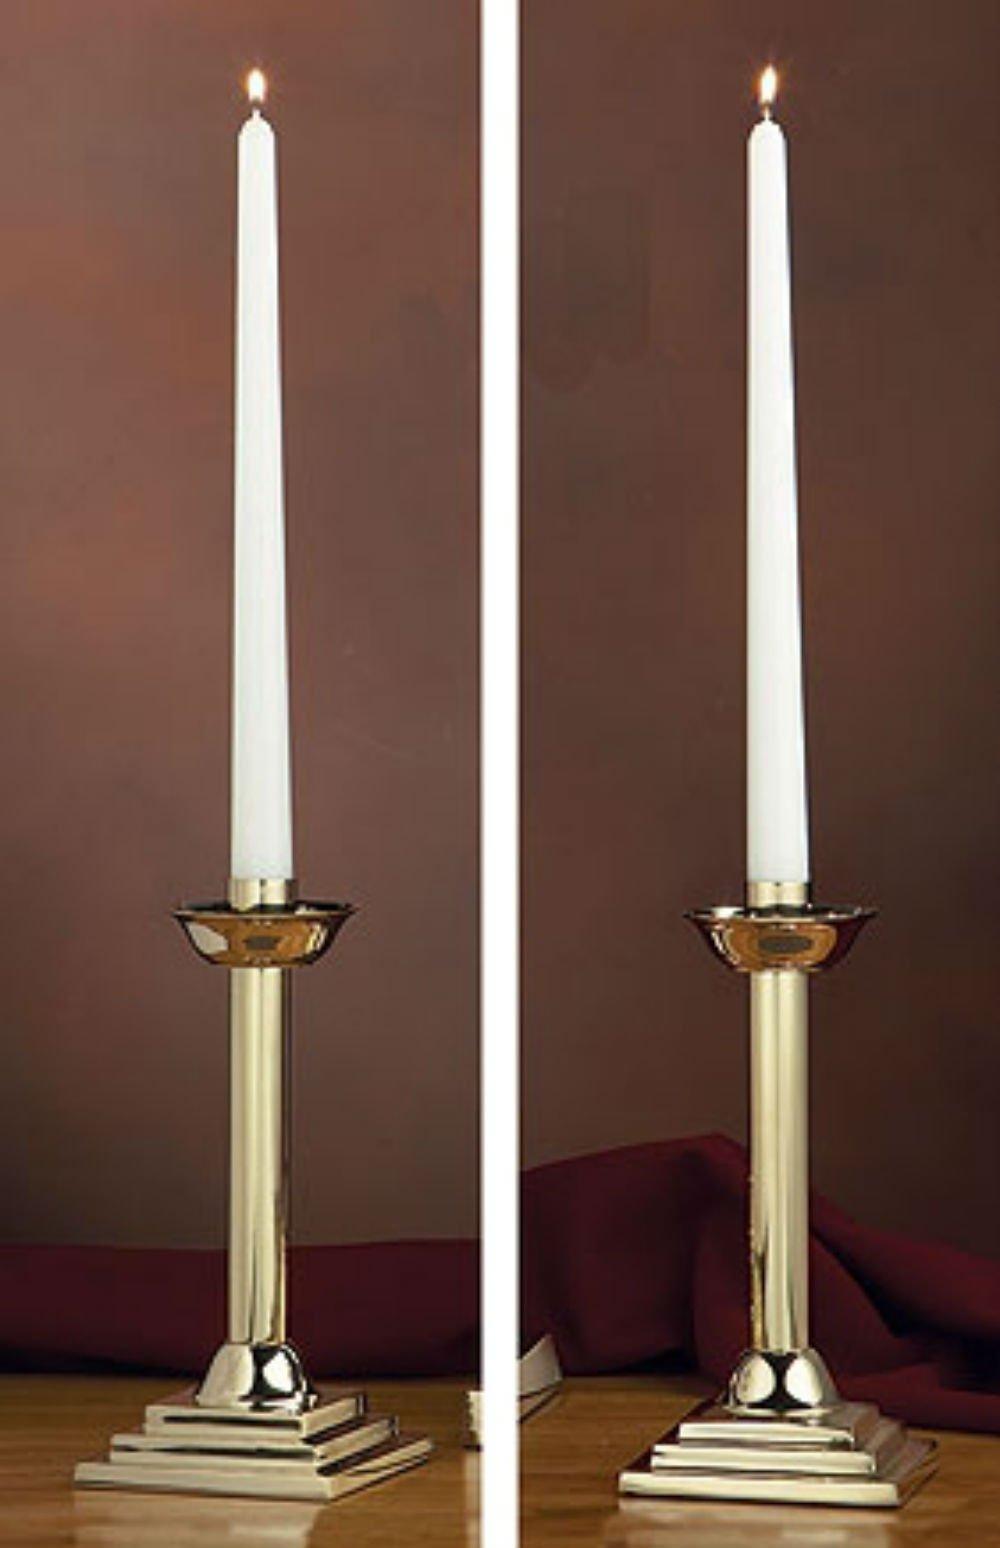 Set of 2 Altar Candlesticks